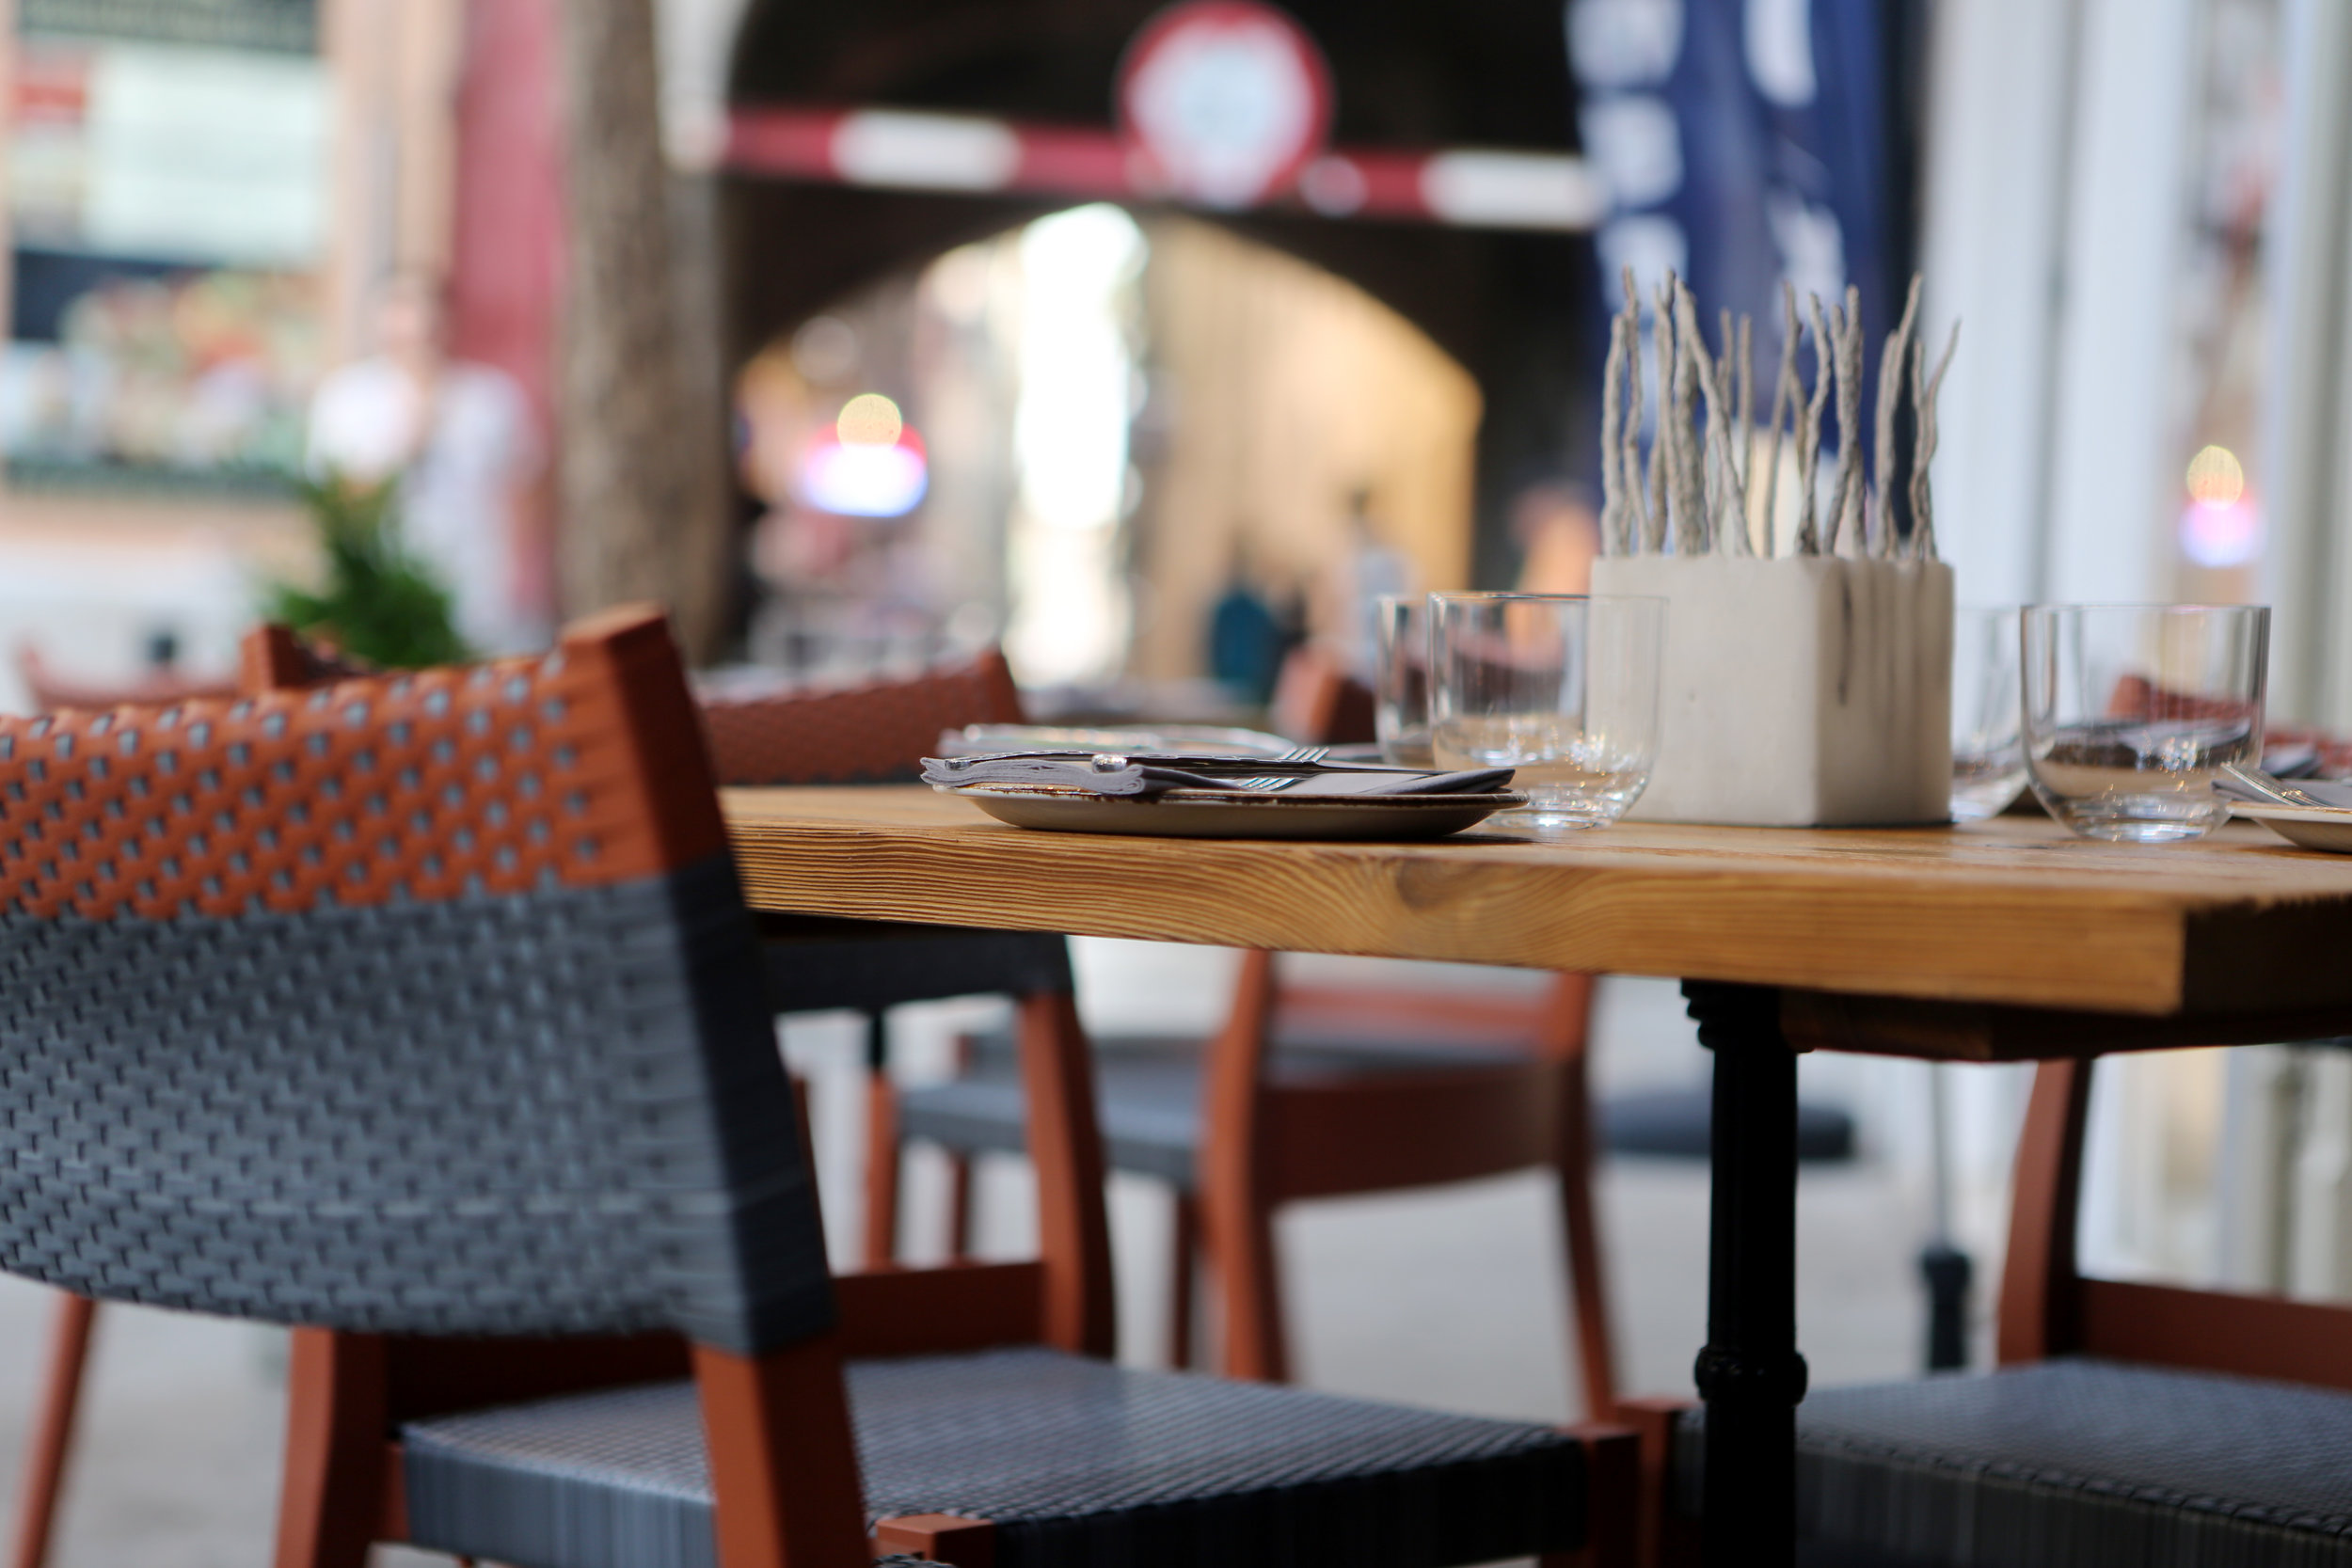 city-restaurant-table-pavement.jpg